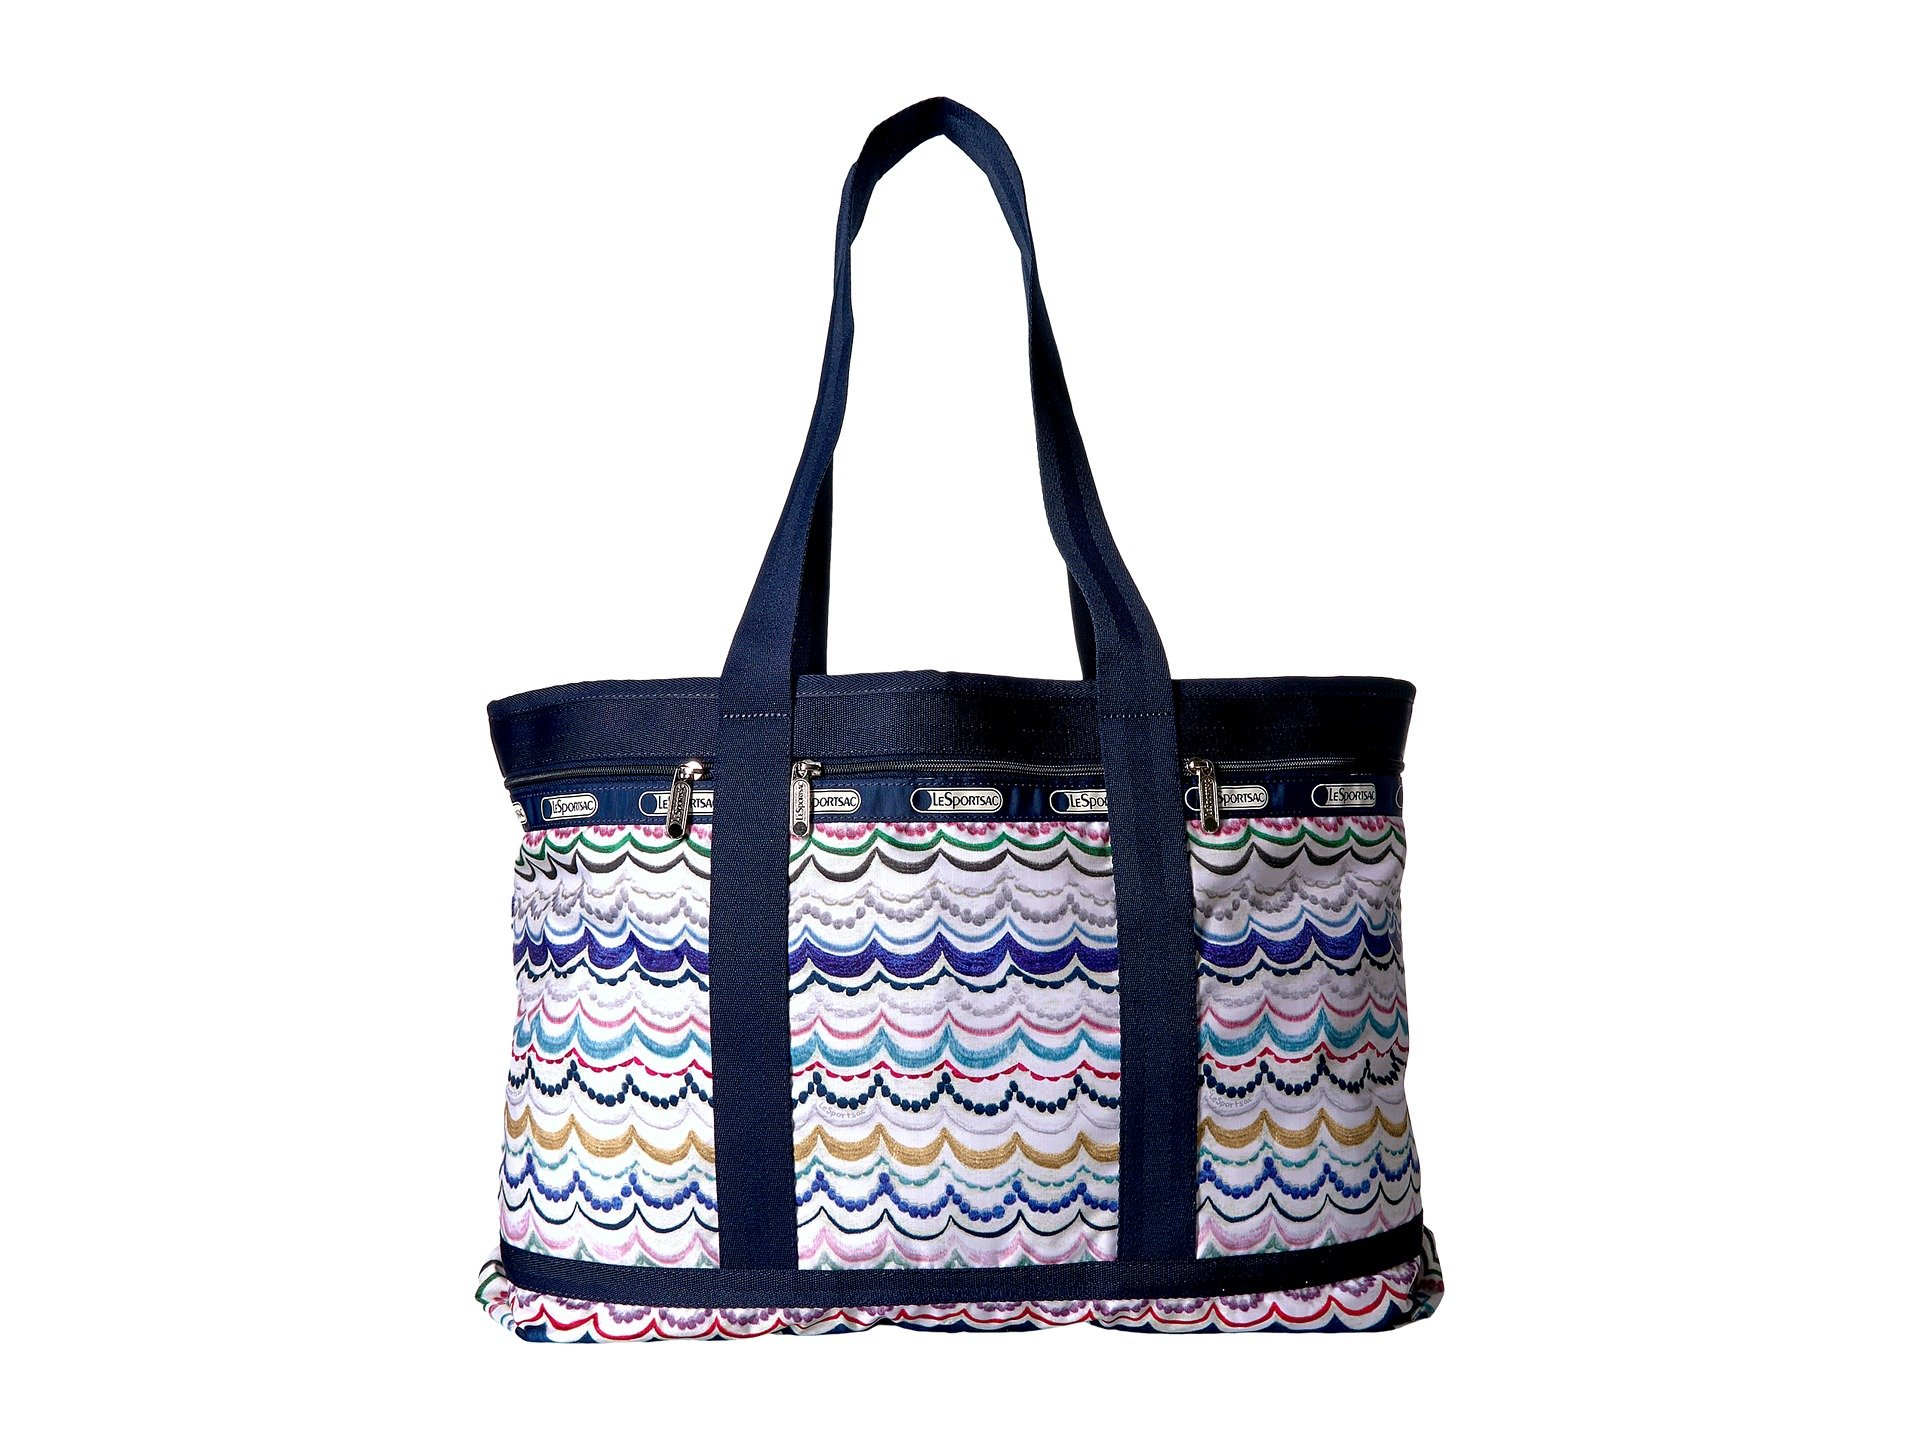 Bolso de Viaje para Mujer LeSportsac Luggage Travel Tote  + LeSportsac en VeoyCompro.net